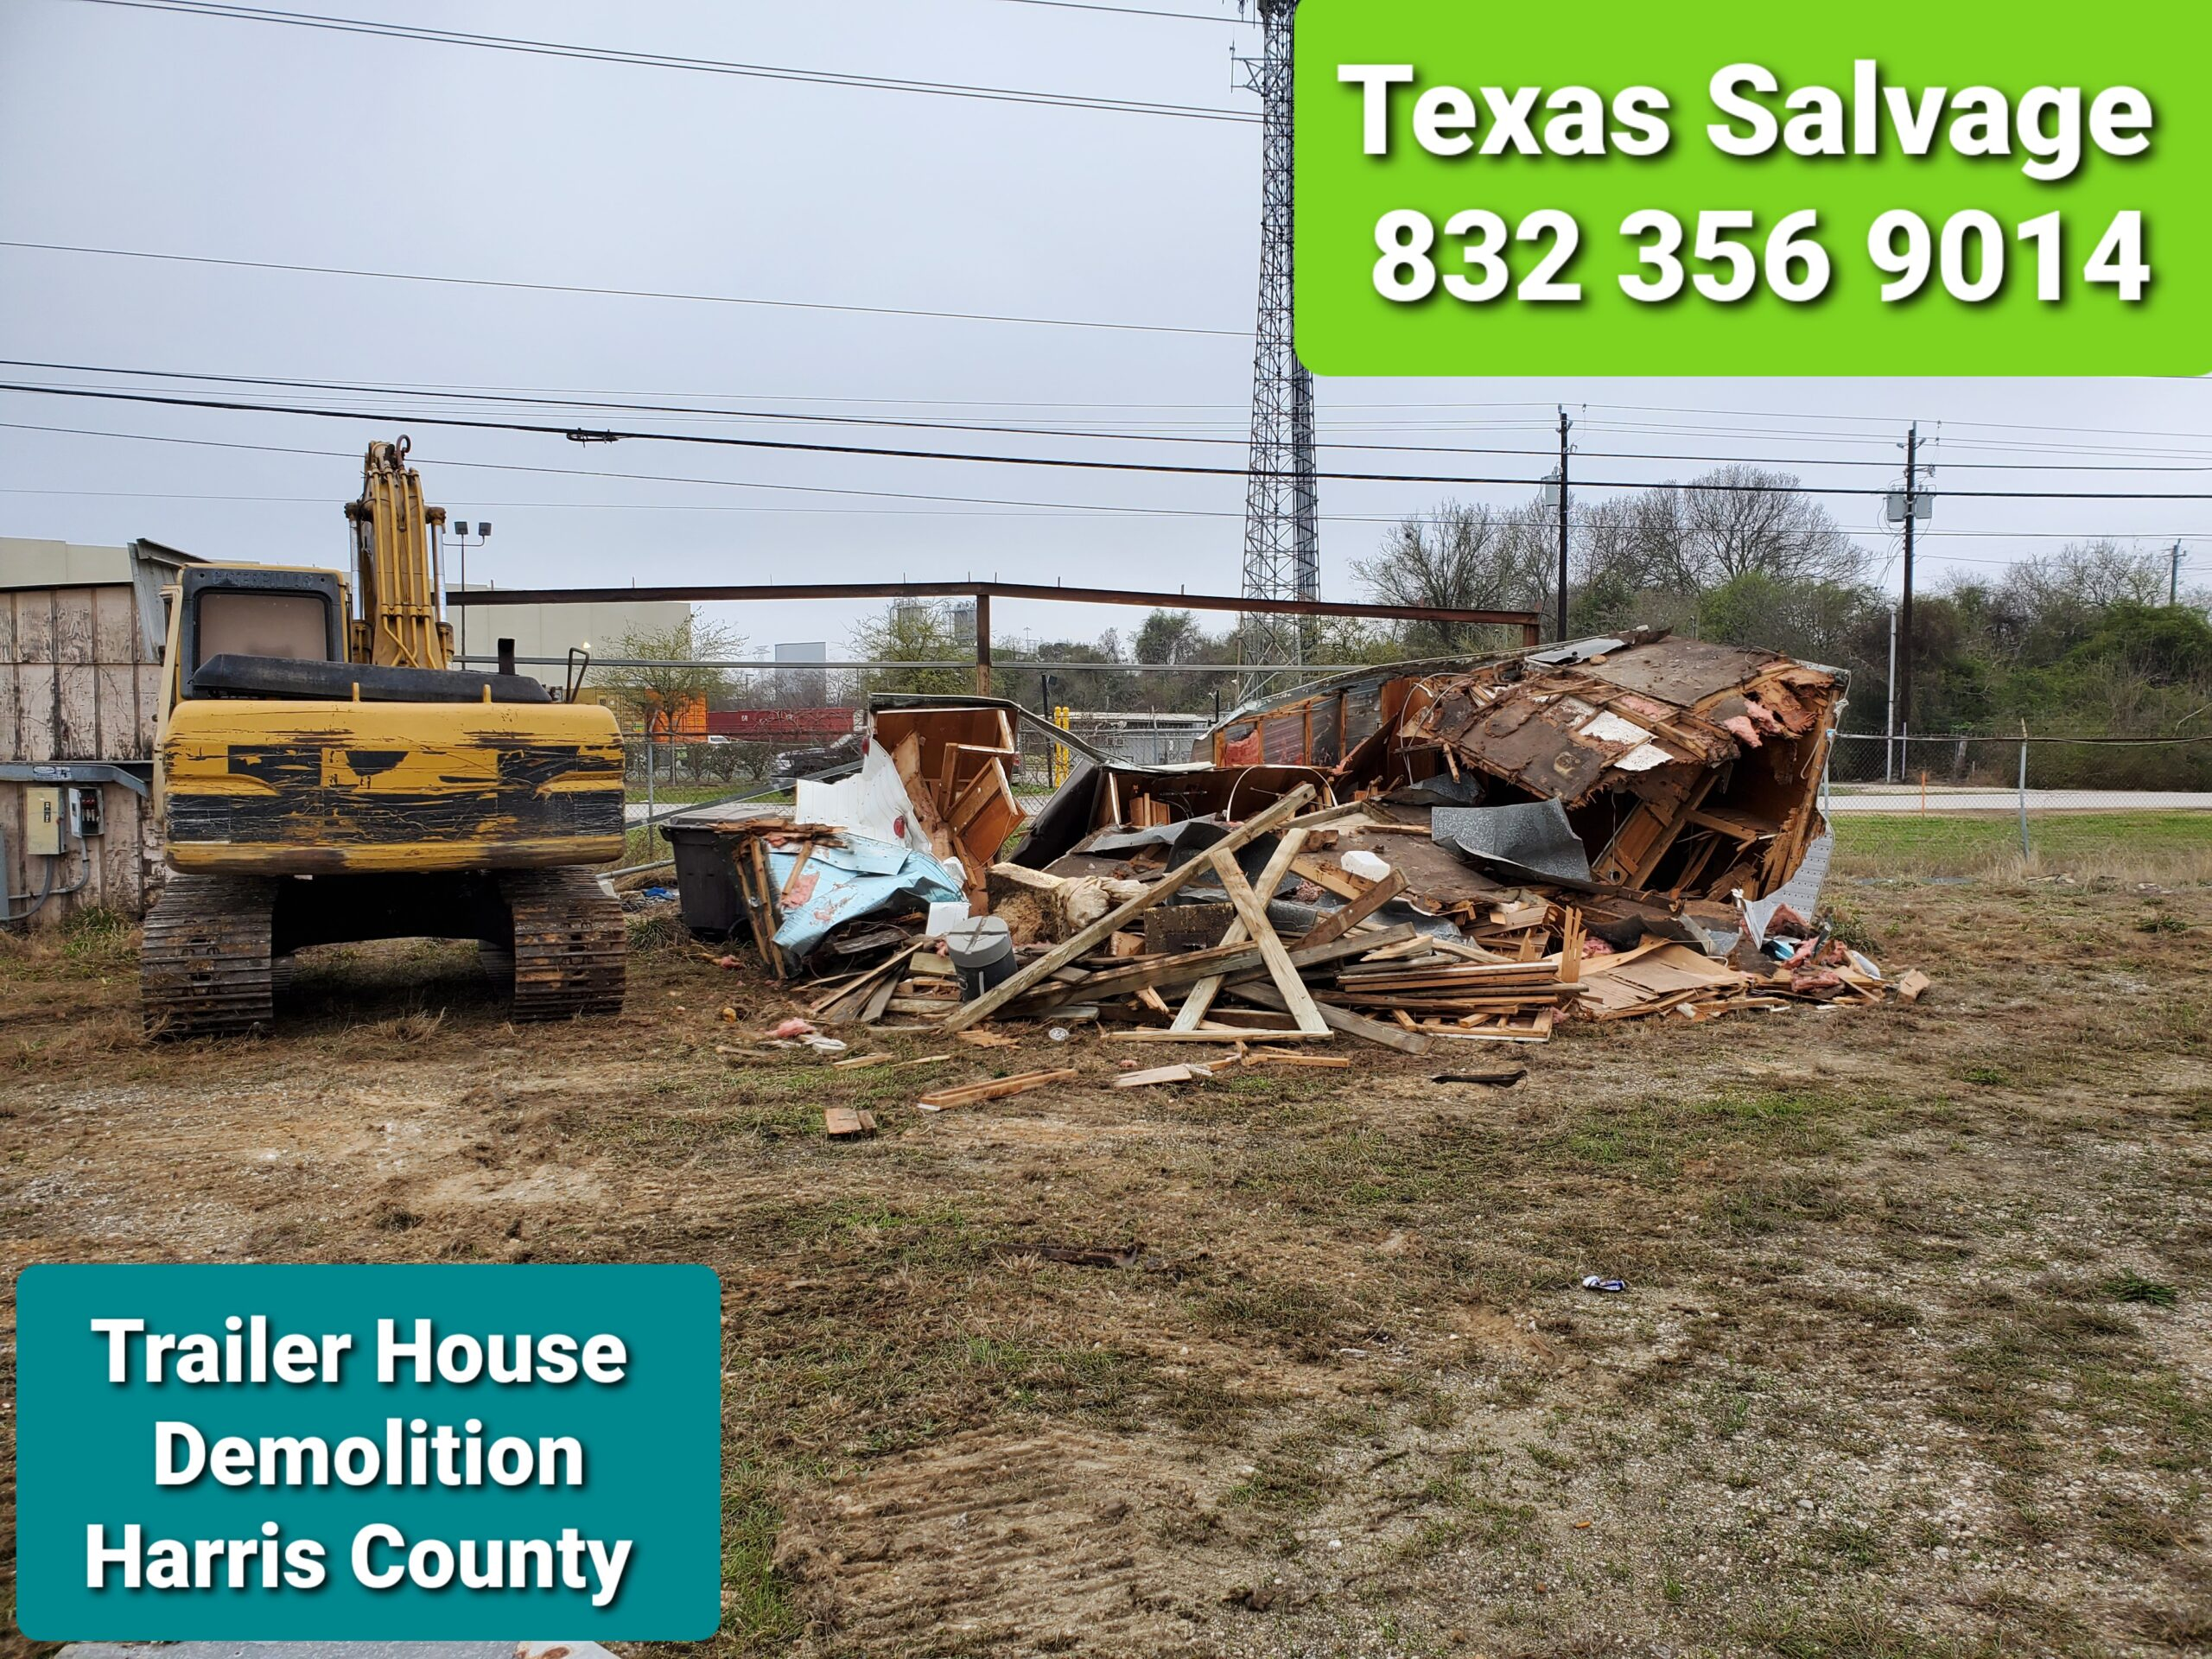 Trailer house demolition